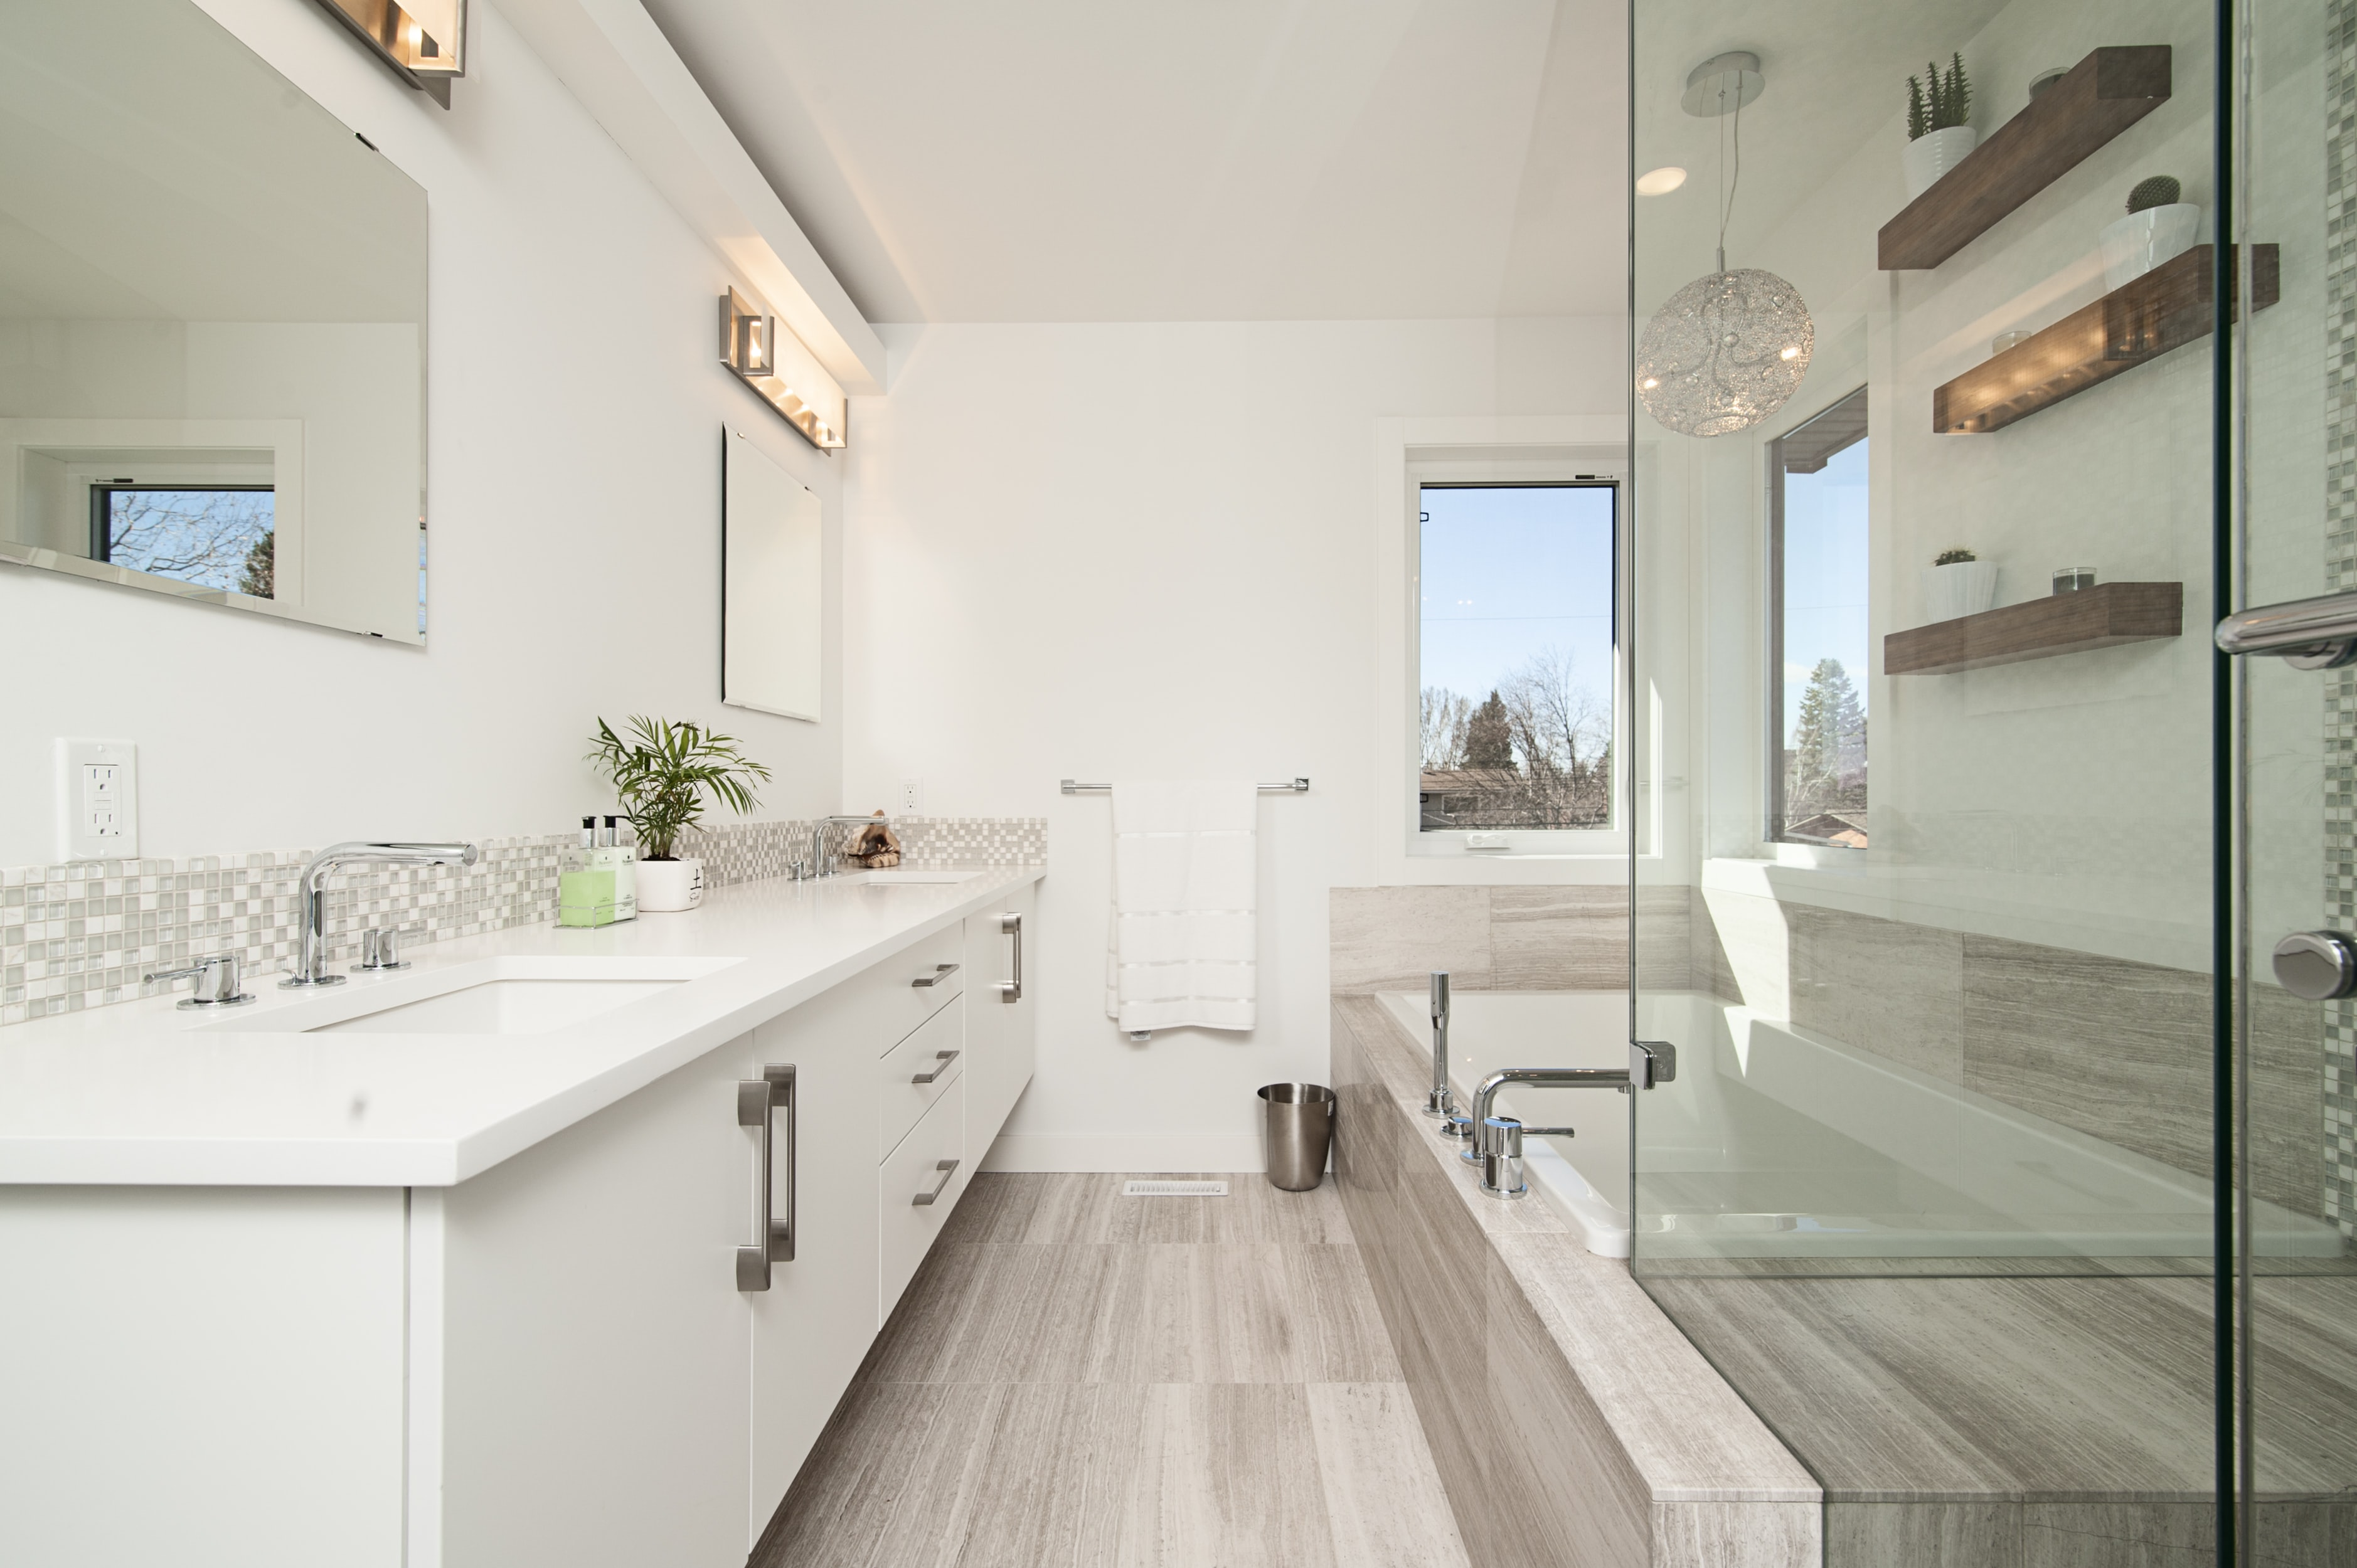 rectangular white wooden bathroom cabinet with sink